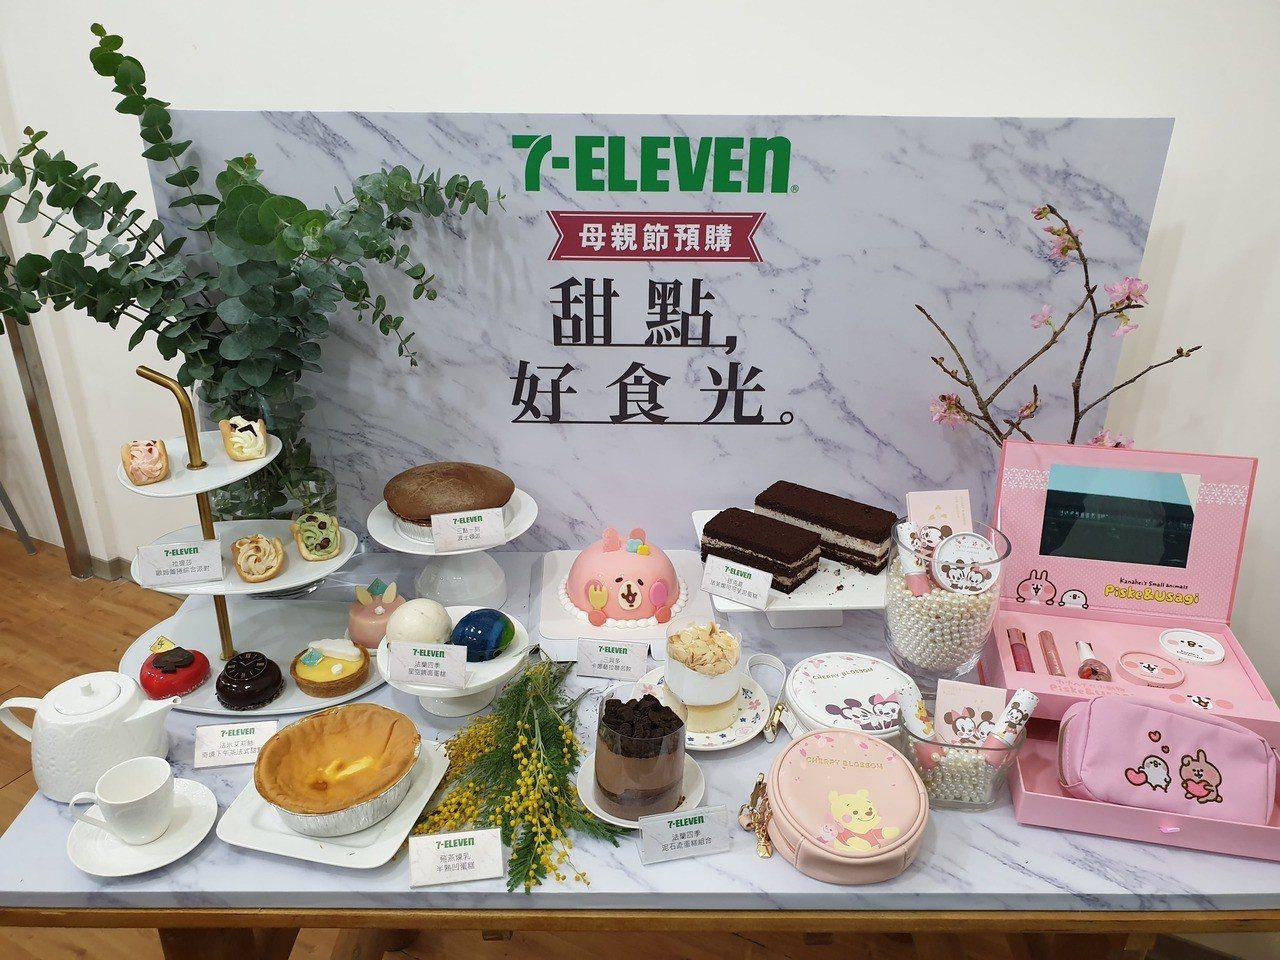 7-ELEVEN母親節預購首度推出「跨界聯名」及「視覺衝擊」的話題蛋糕。記者陳立...